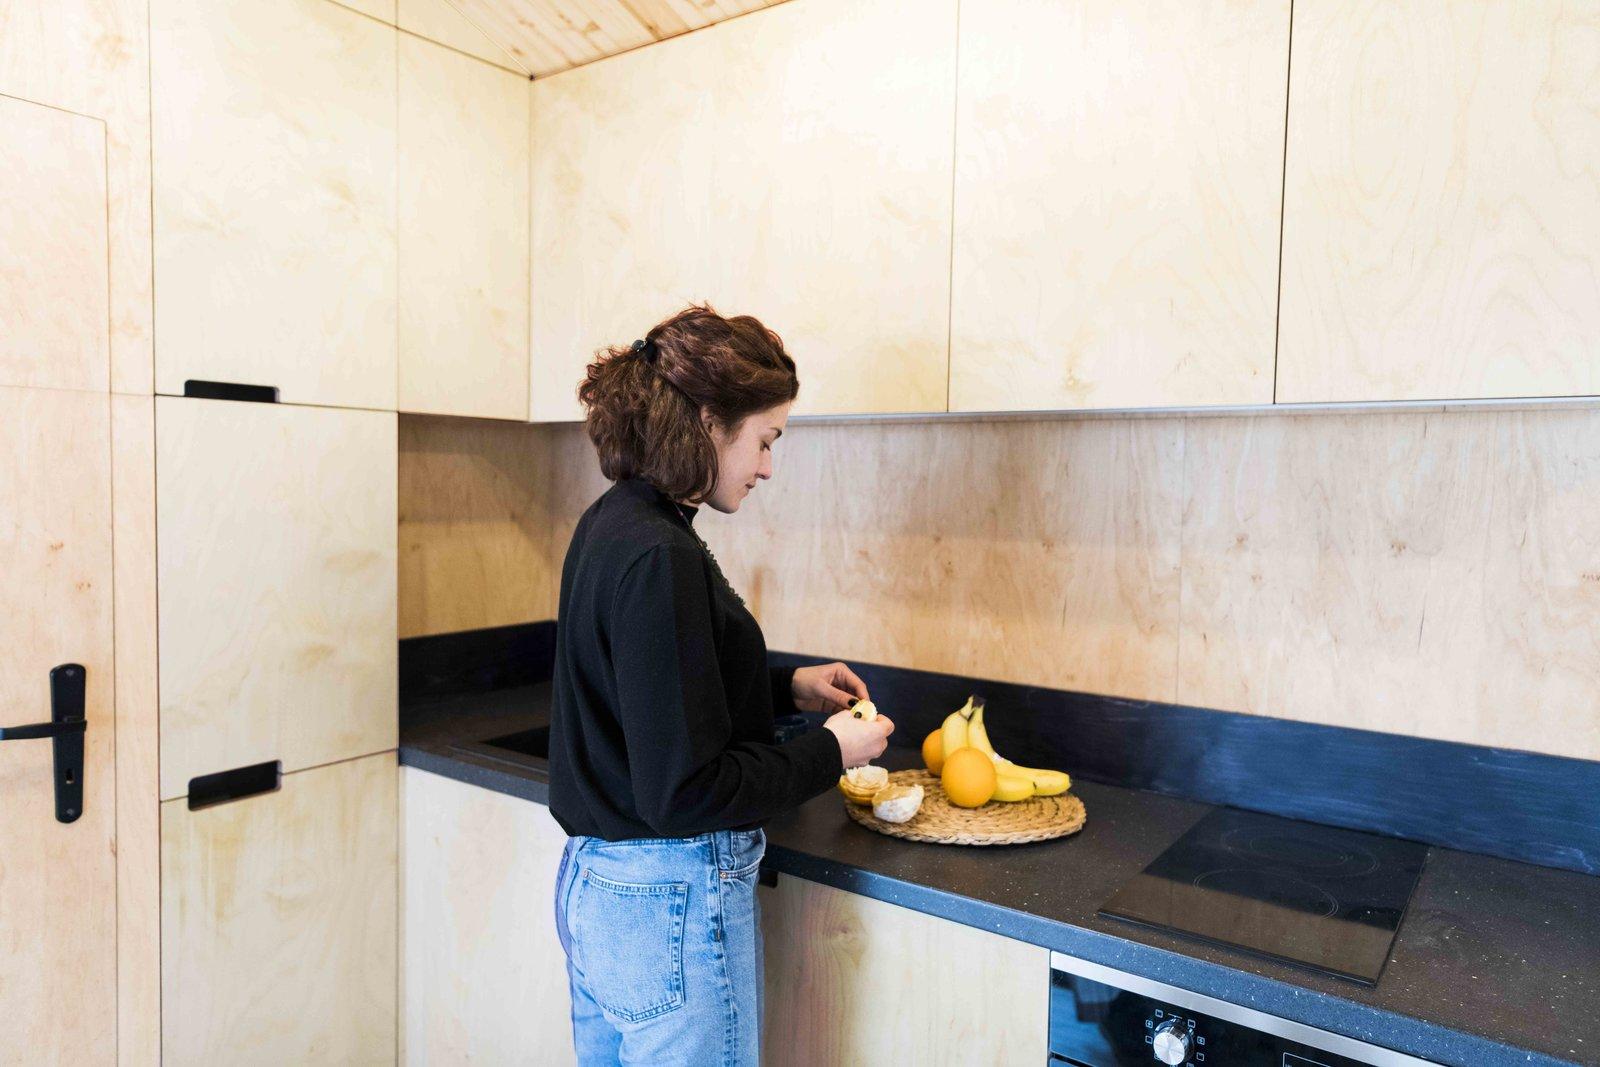 Kitchen, Recessed Lighting, Cooktops, Wood Cabinet, and Light Hardwood Floor Contrasting kitchen worktop  KOLELIBA Family Tiny House